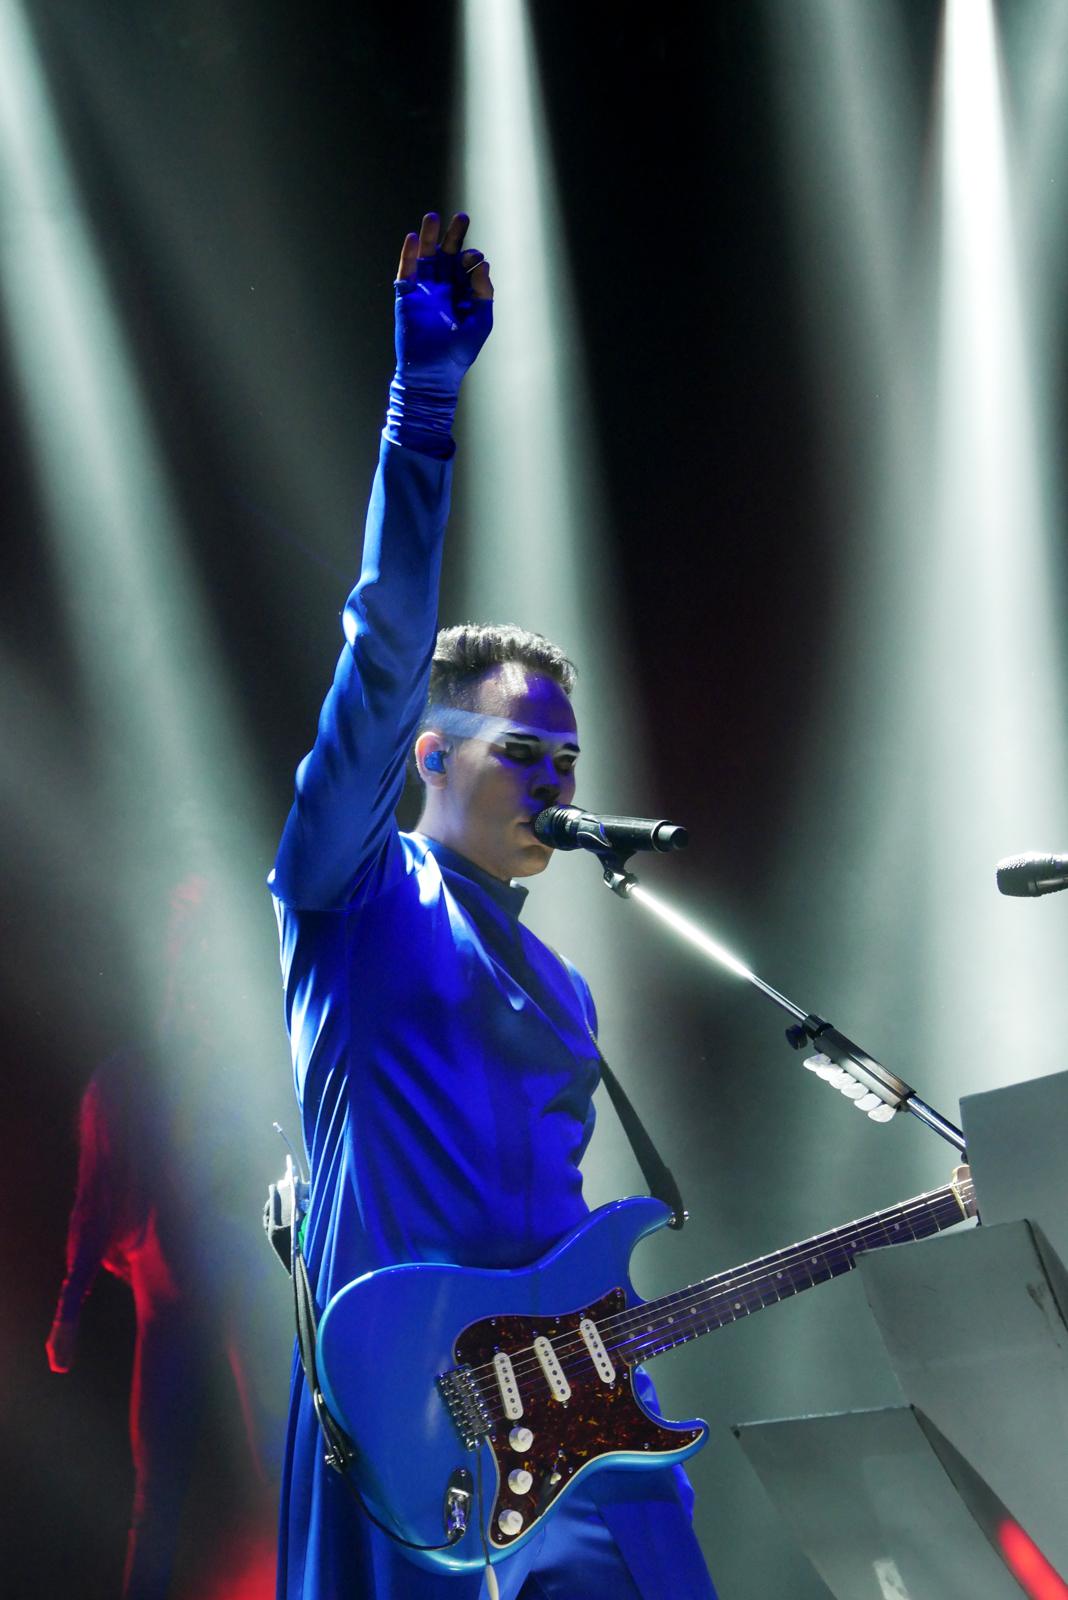 empire-of-the-sun-concert-paris-olympia-two-vines-tour-live-stage-photo-usofparis-blog